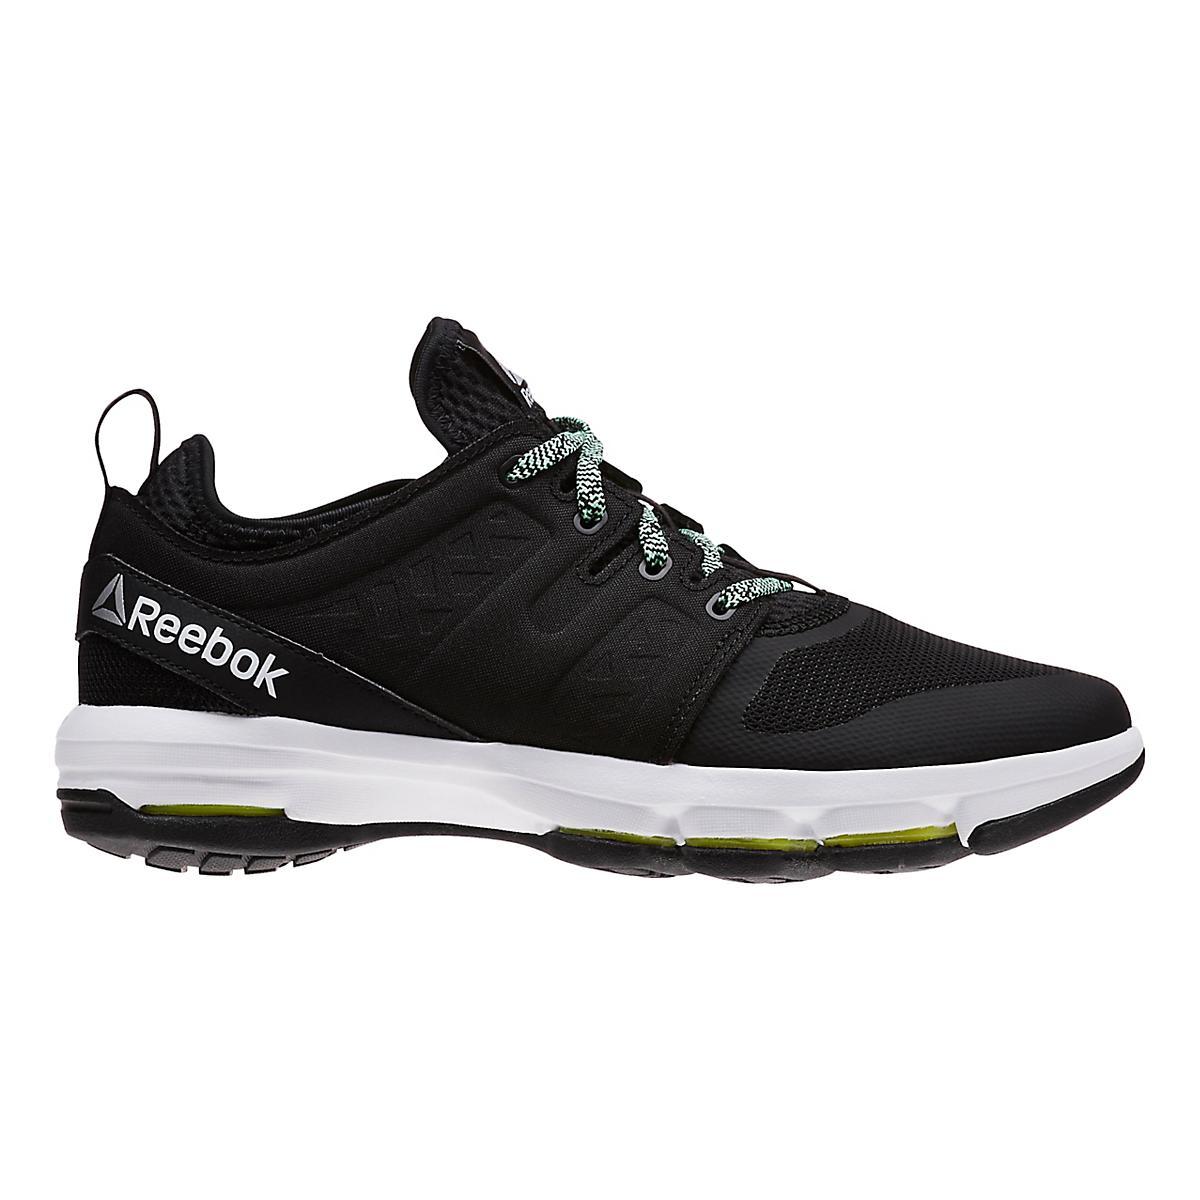 d6adcd3ac9c best sneakers Womens Reebok Cloudride DMX Walking Shoe at Road Runner  Sports 1d802 3c991  big sale ...